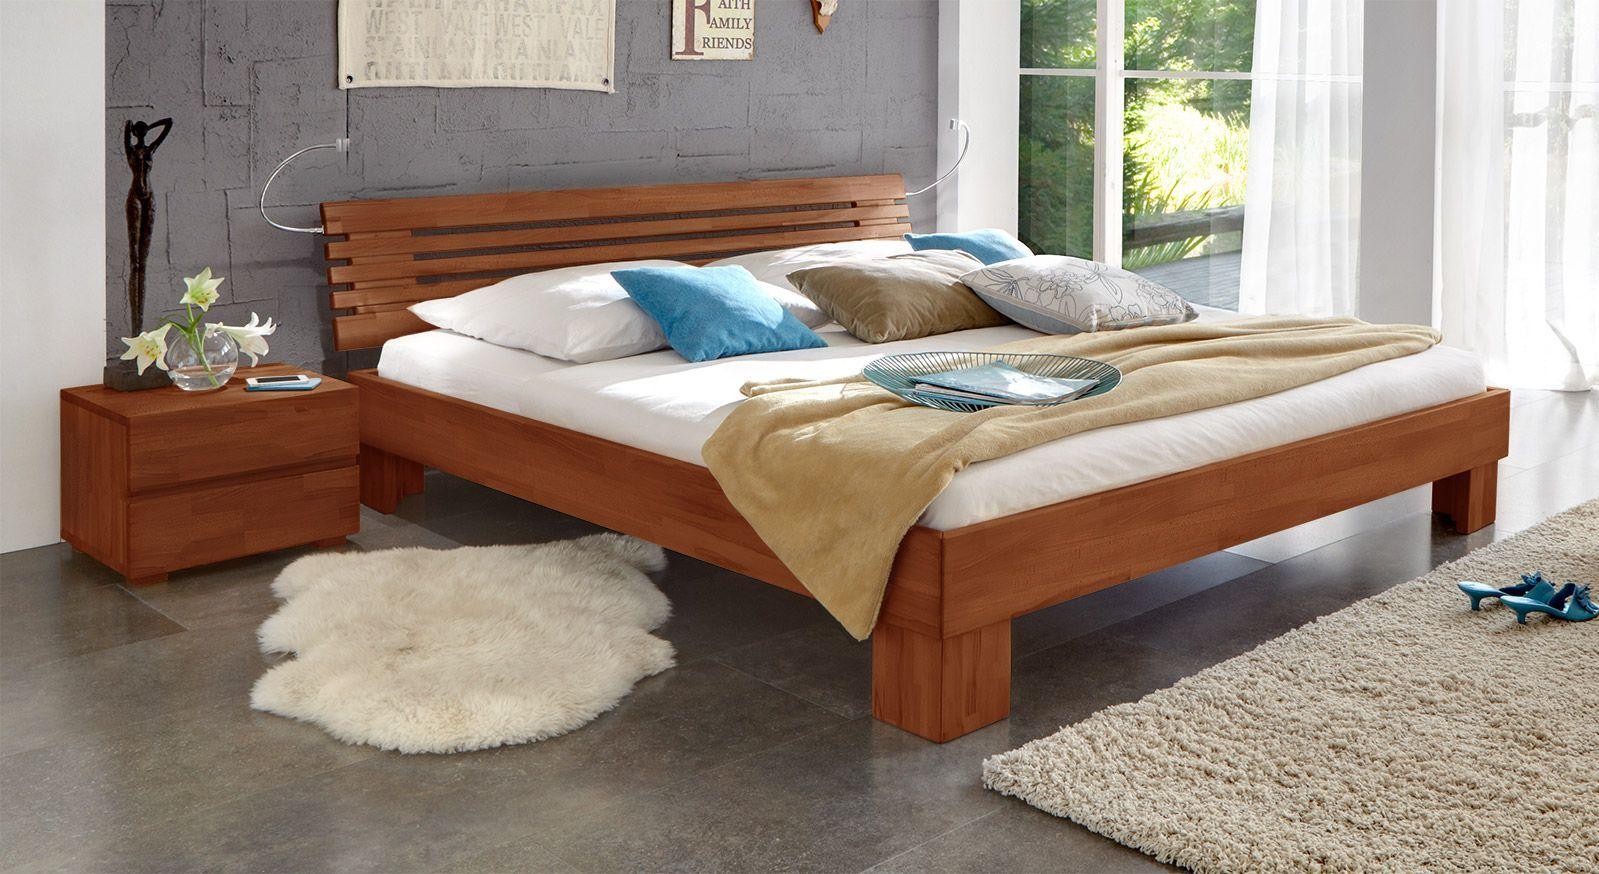 Massivholzbett Wood Romance in kirschbaumfarben in 20cm